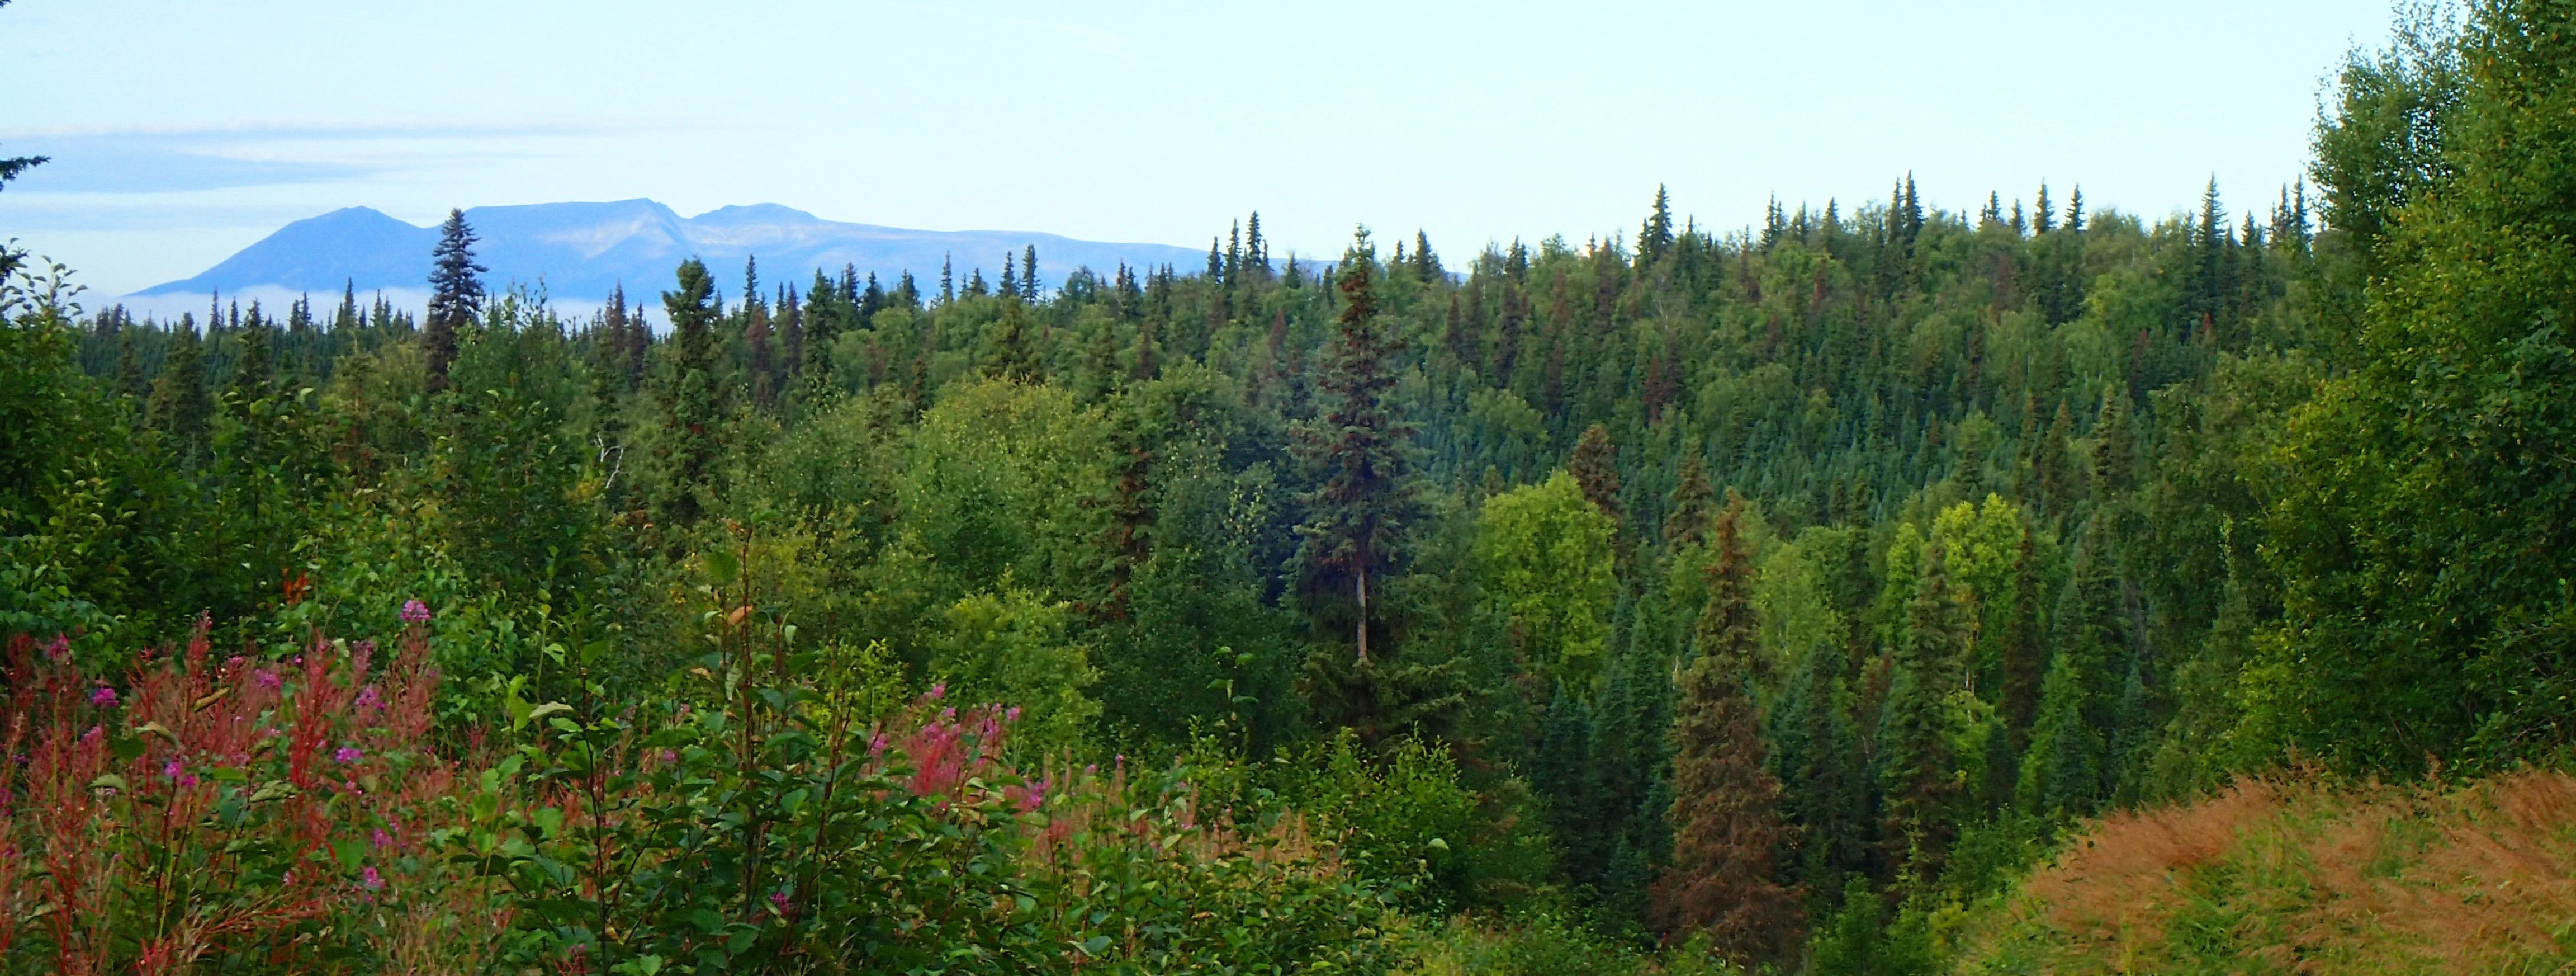 Spruce Beetle in Alaska's Forests